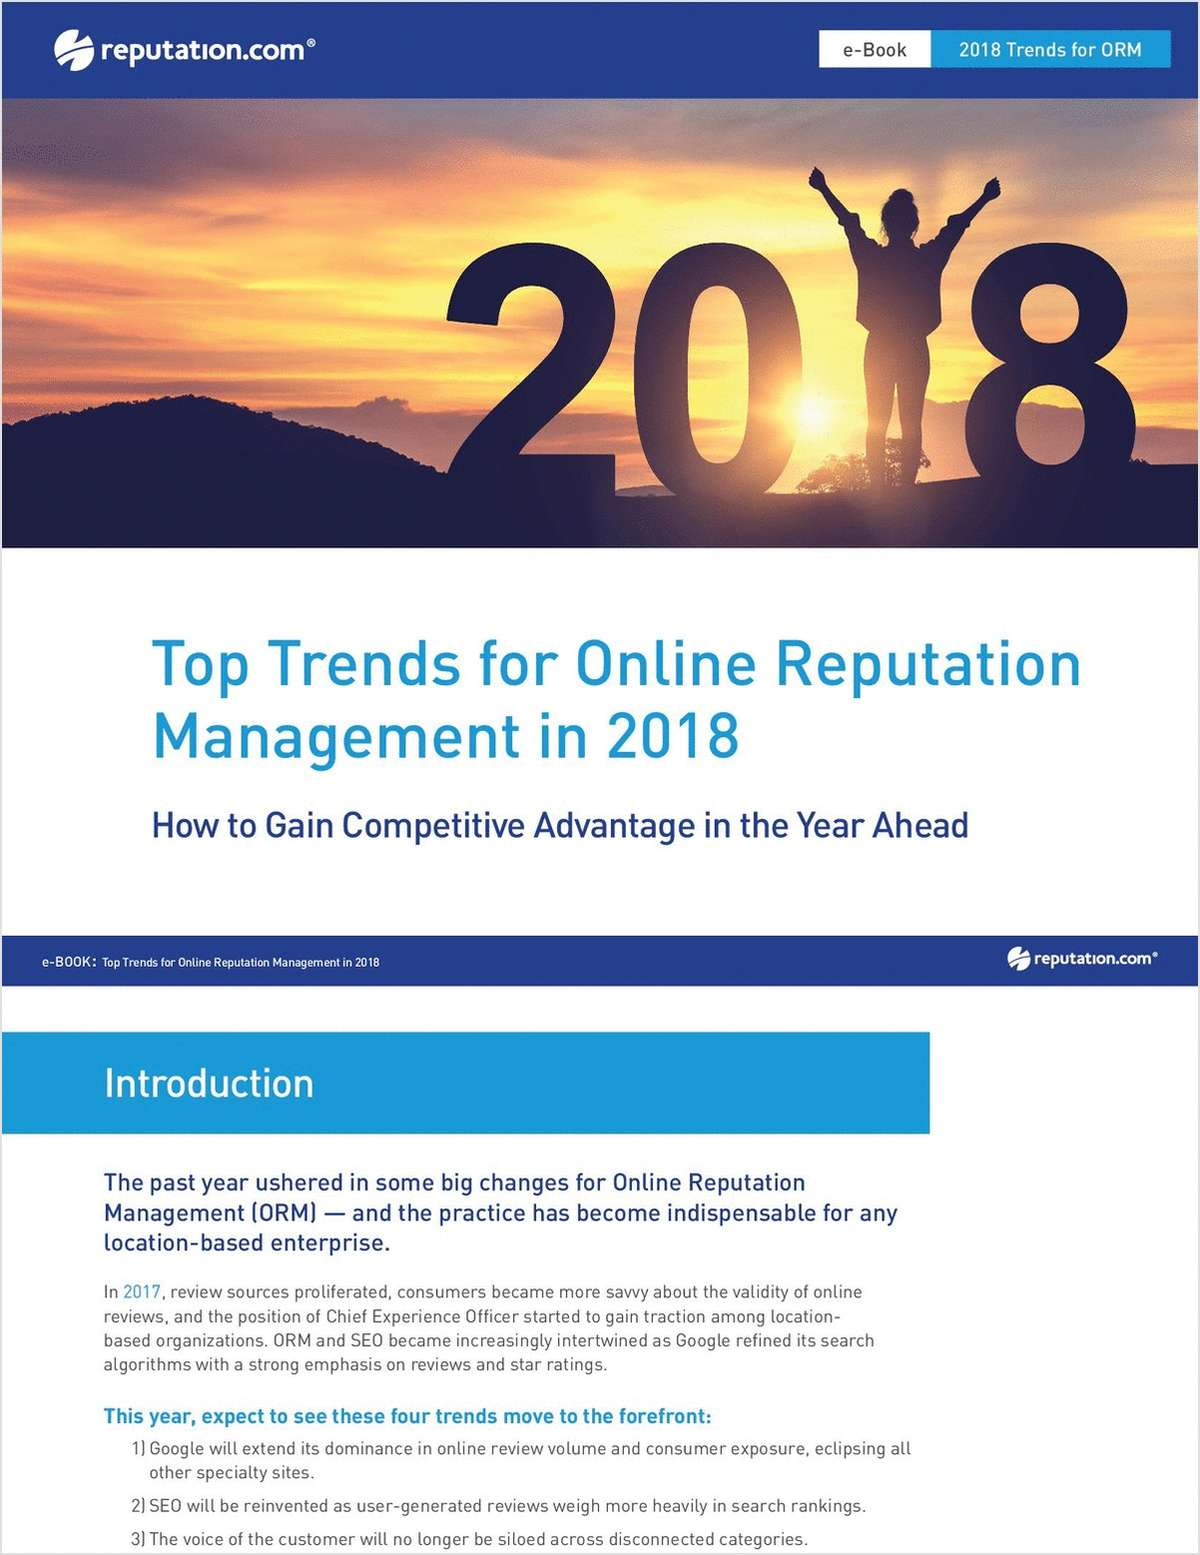 Top Trends for Online Reputation Management